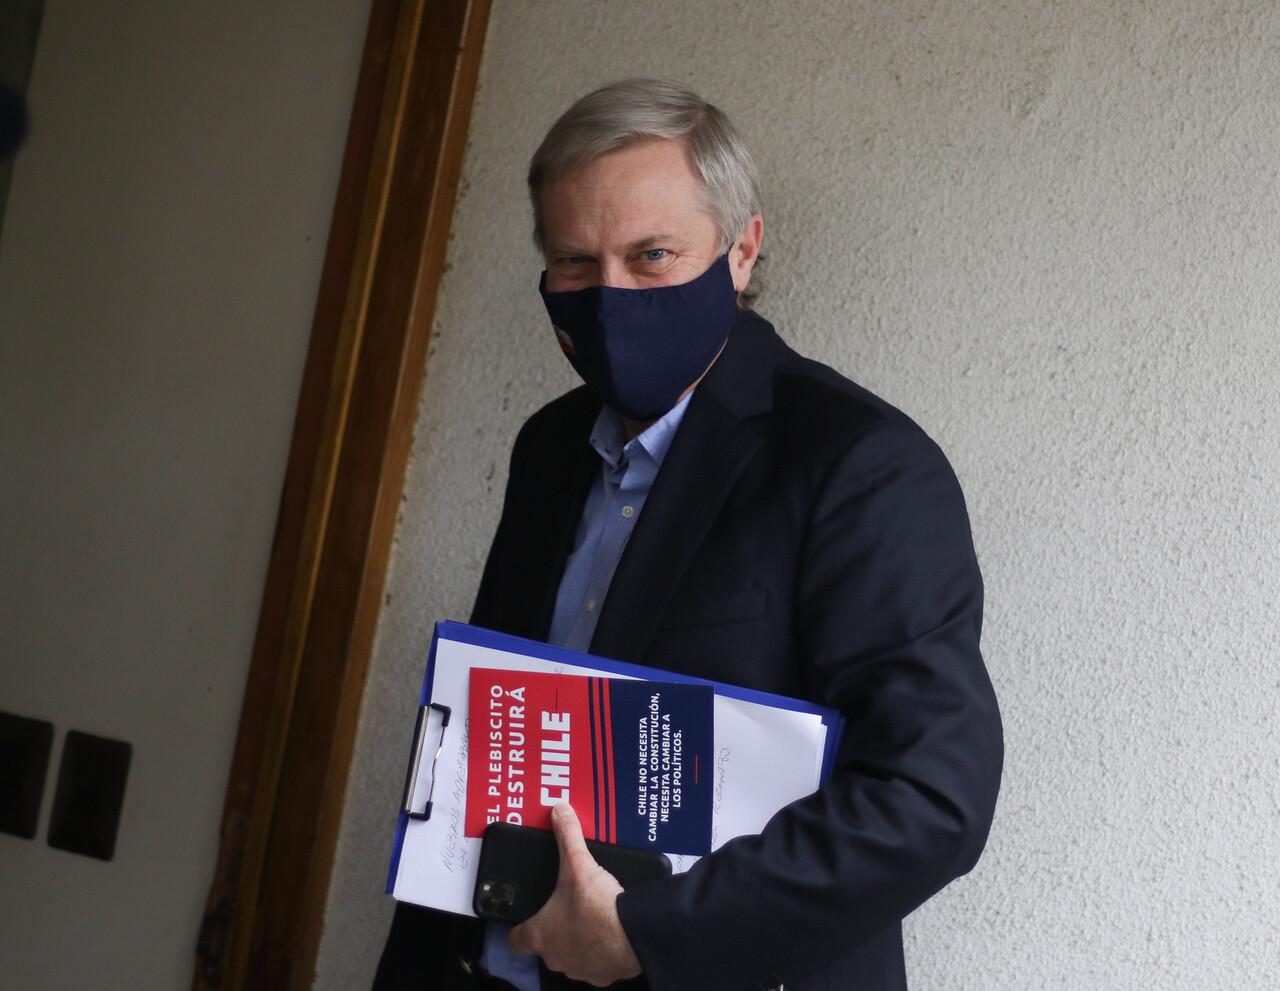 partido-republicano-jose-antonio-kast-chile-vamos-lista-unica-constituyentes